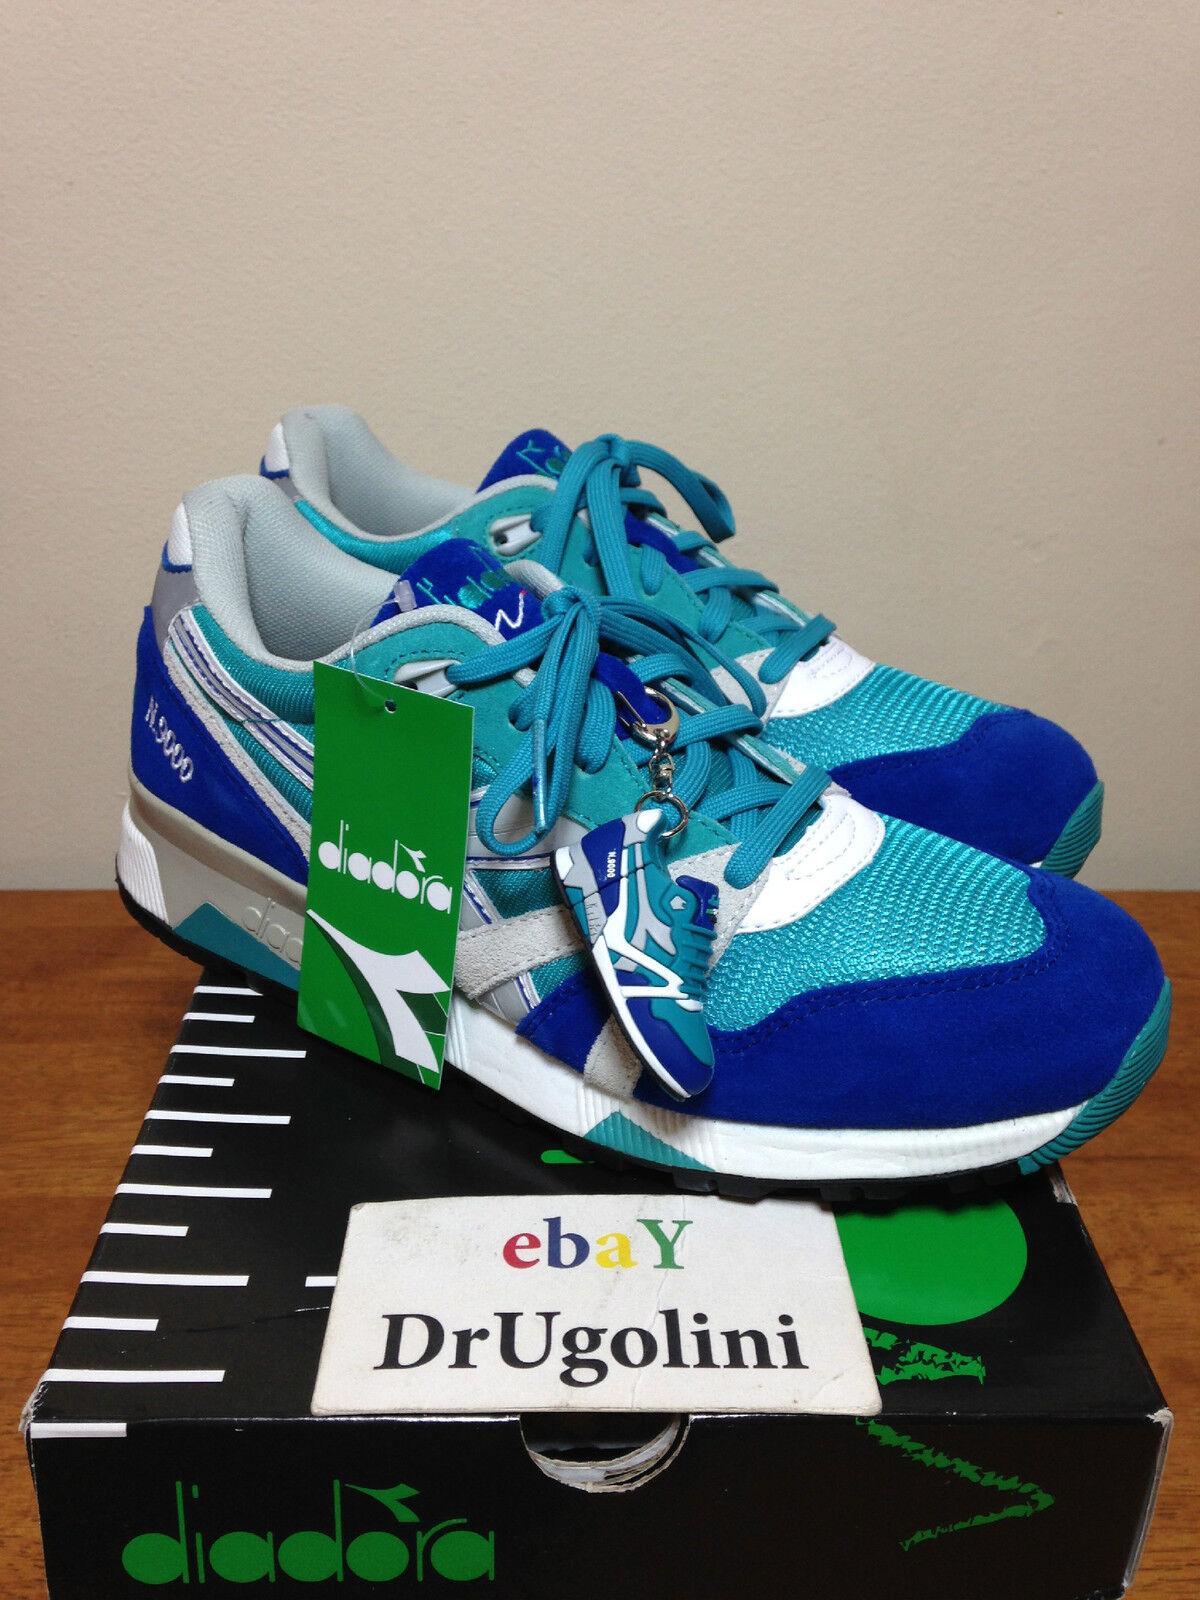 DIADORA N9000 OG 7-13 GREEN WHITE BLUE 160741-01-C5681